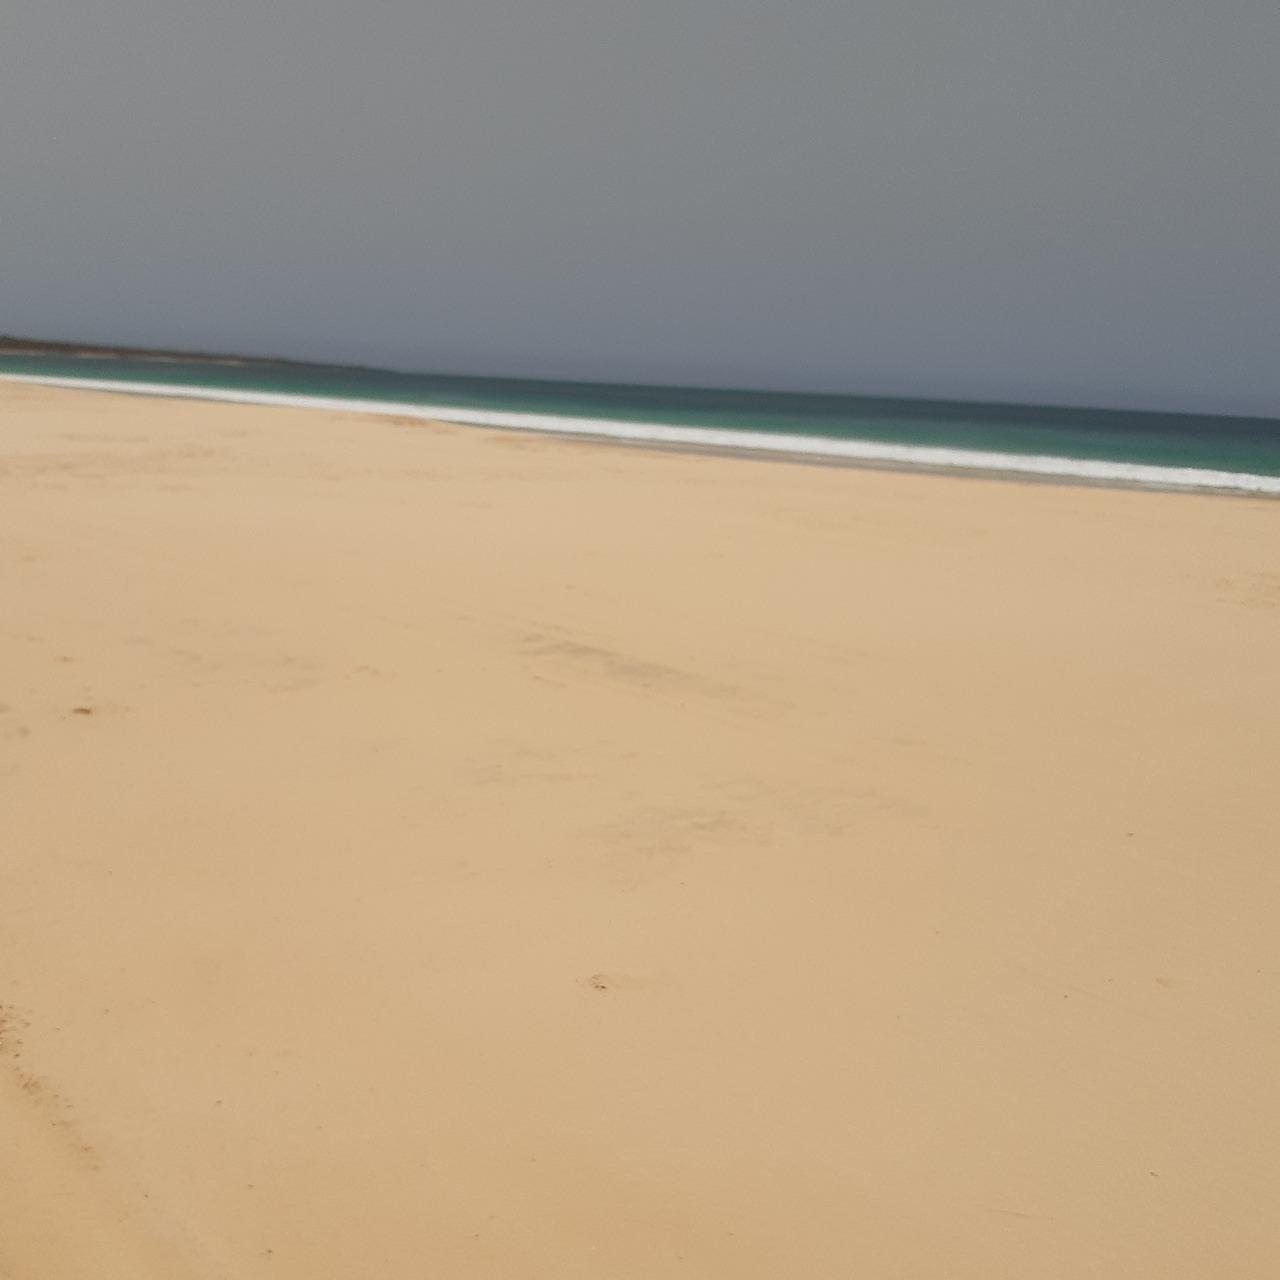 989a756e9f296 ROYAL HORIZONS BOA VISTA $110 ($̶1̶5̶3̶) - Updated 2019 Prices & Resort  Reviews - Cape Verde - TripAdvisor